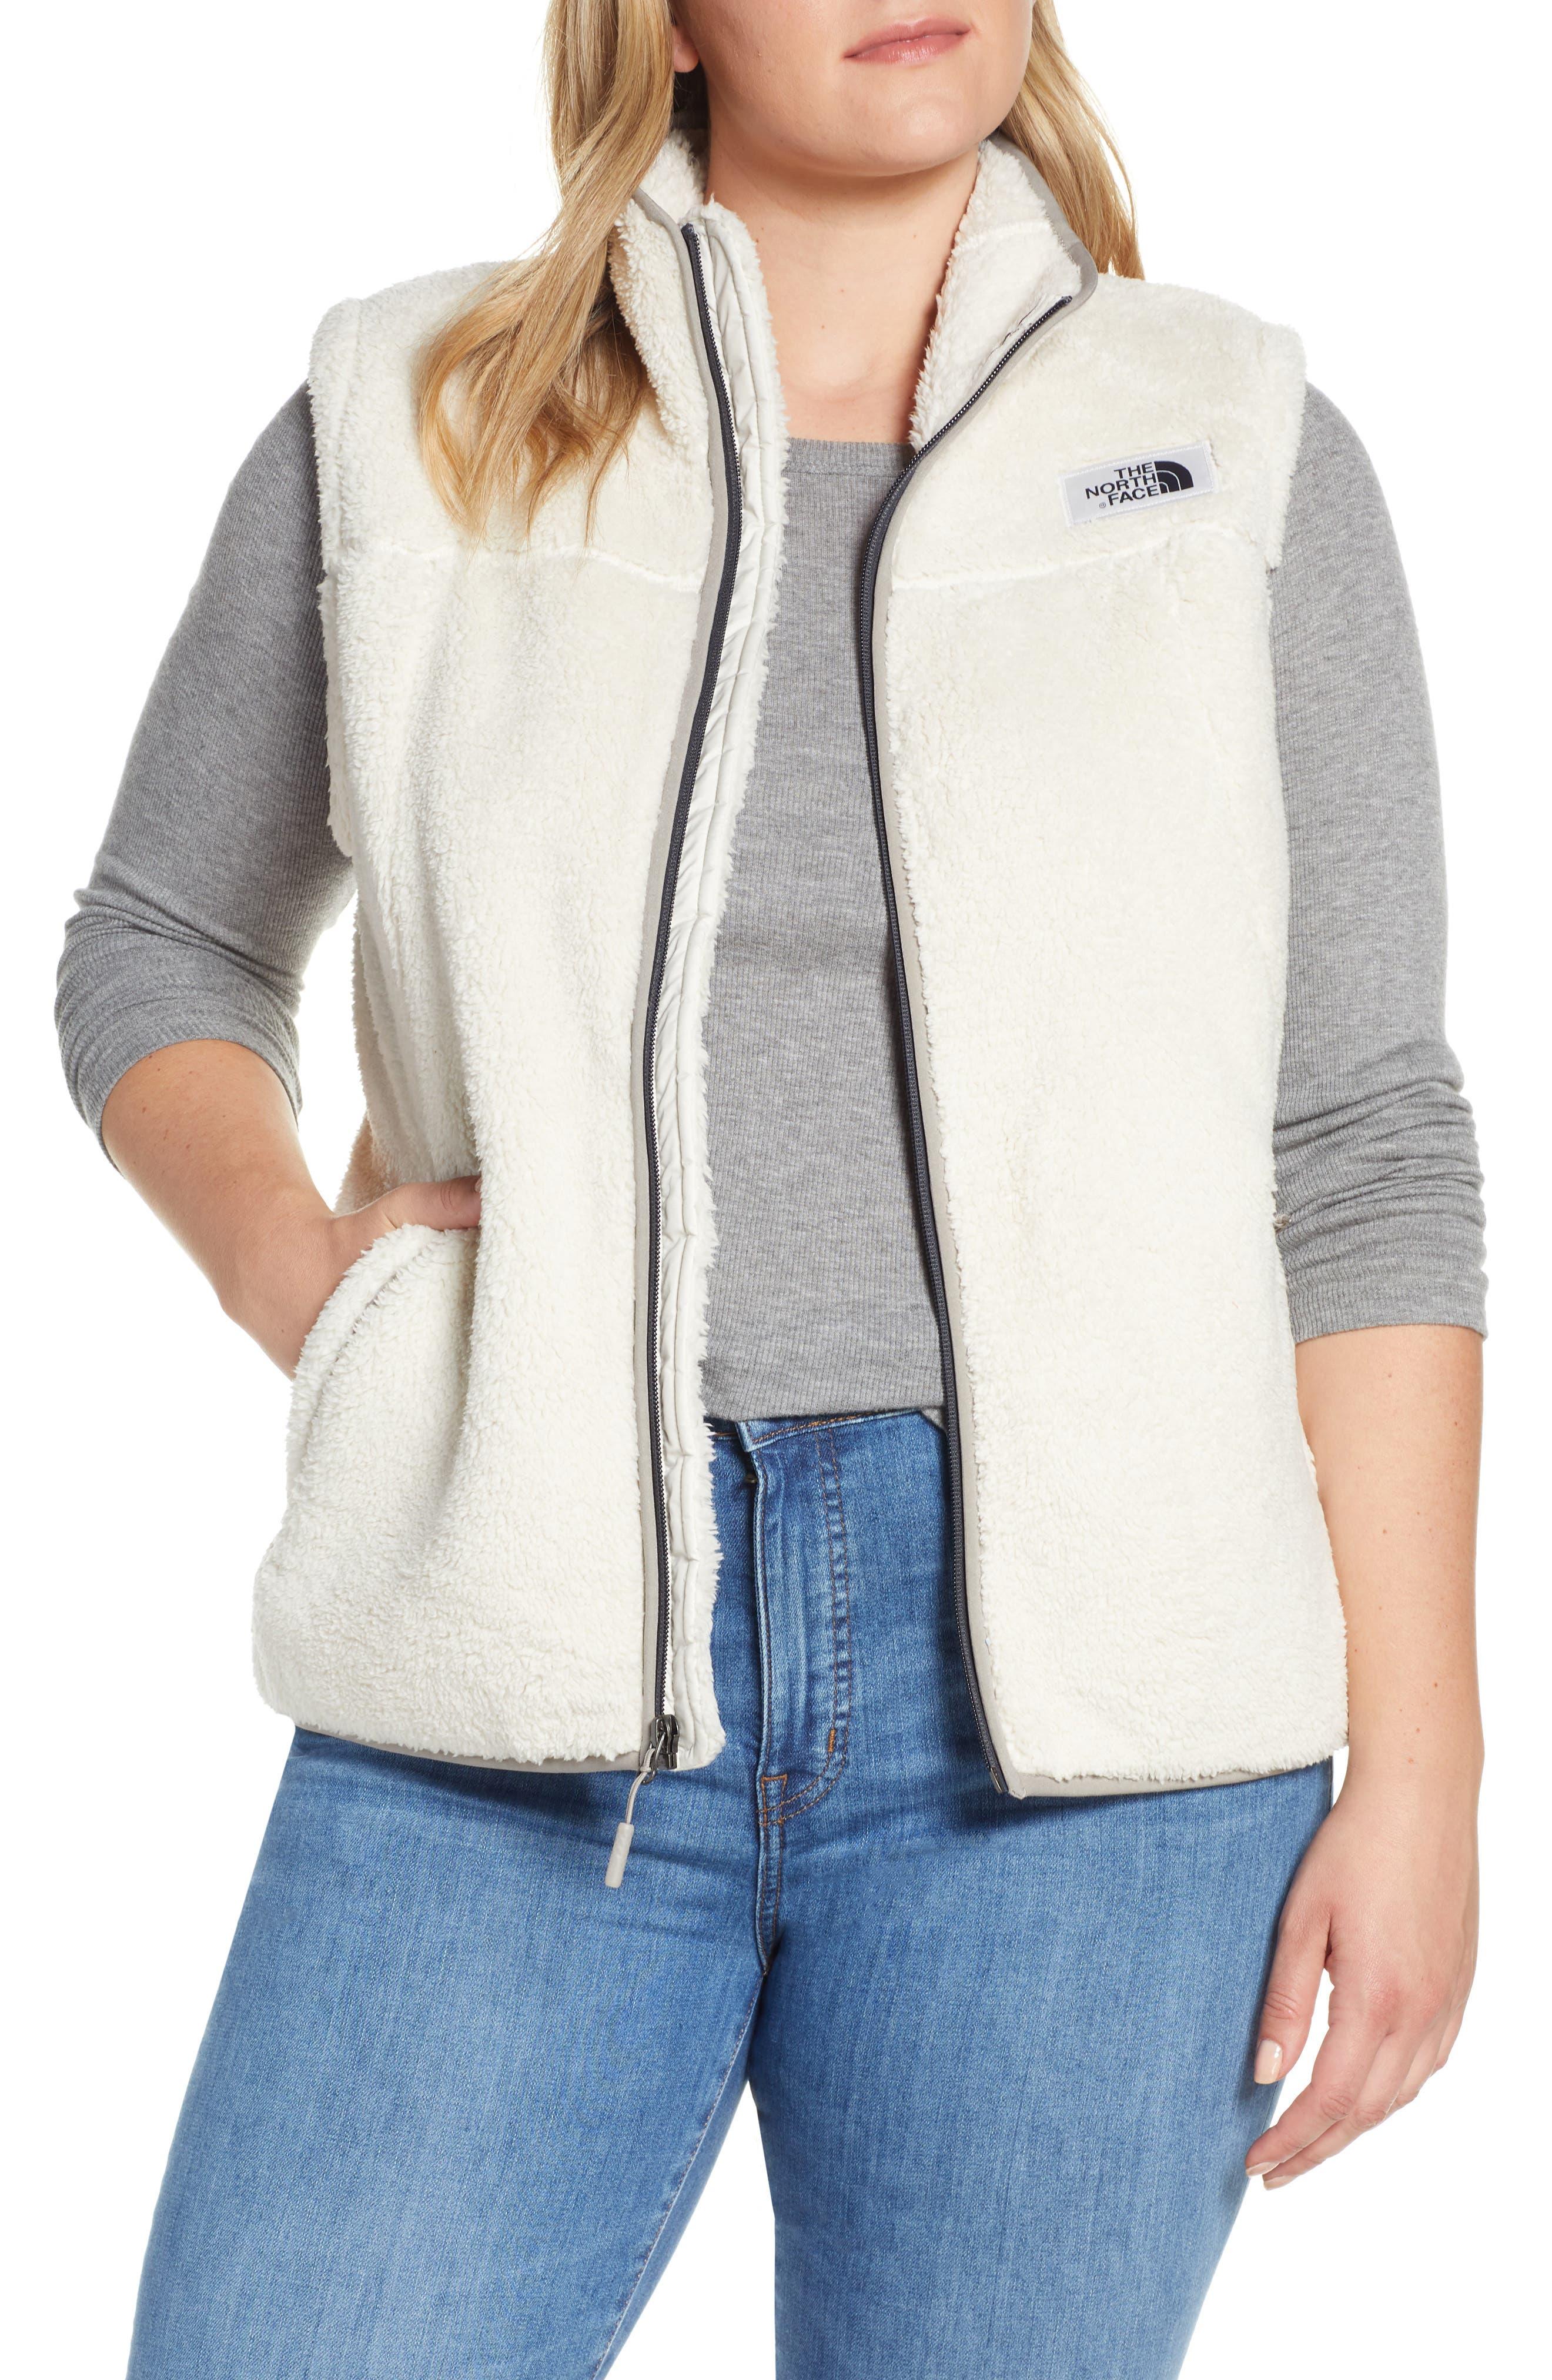 THE NORTH FACE, Campshire Fleece Vest, Main thumbnail 1, color, VINTAGE WHITE/ GREY